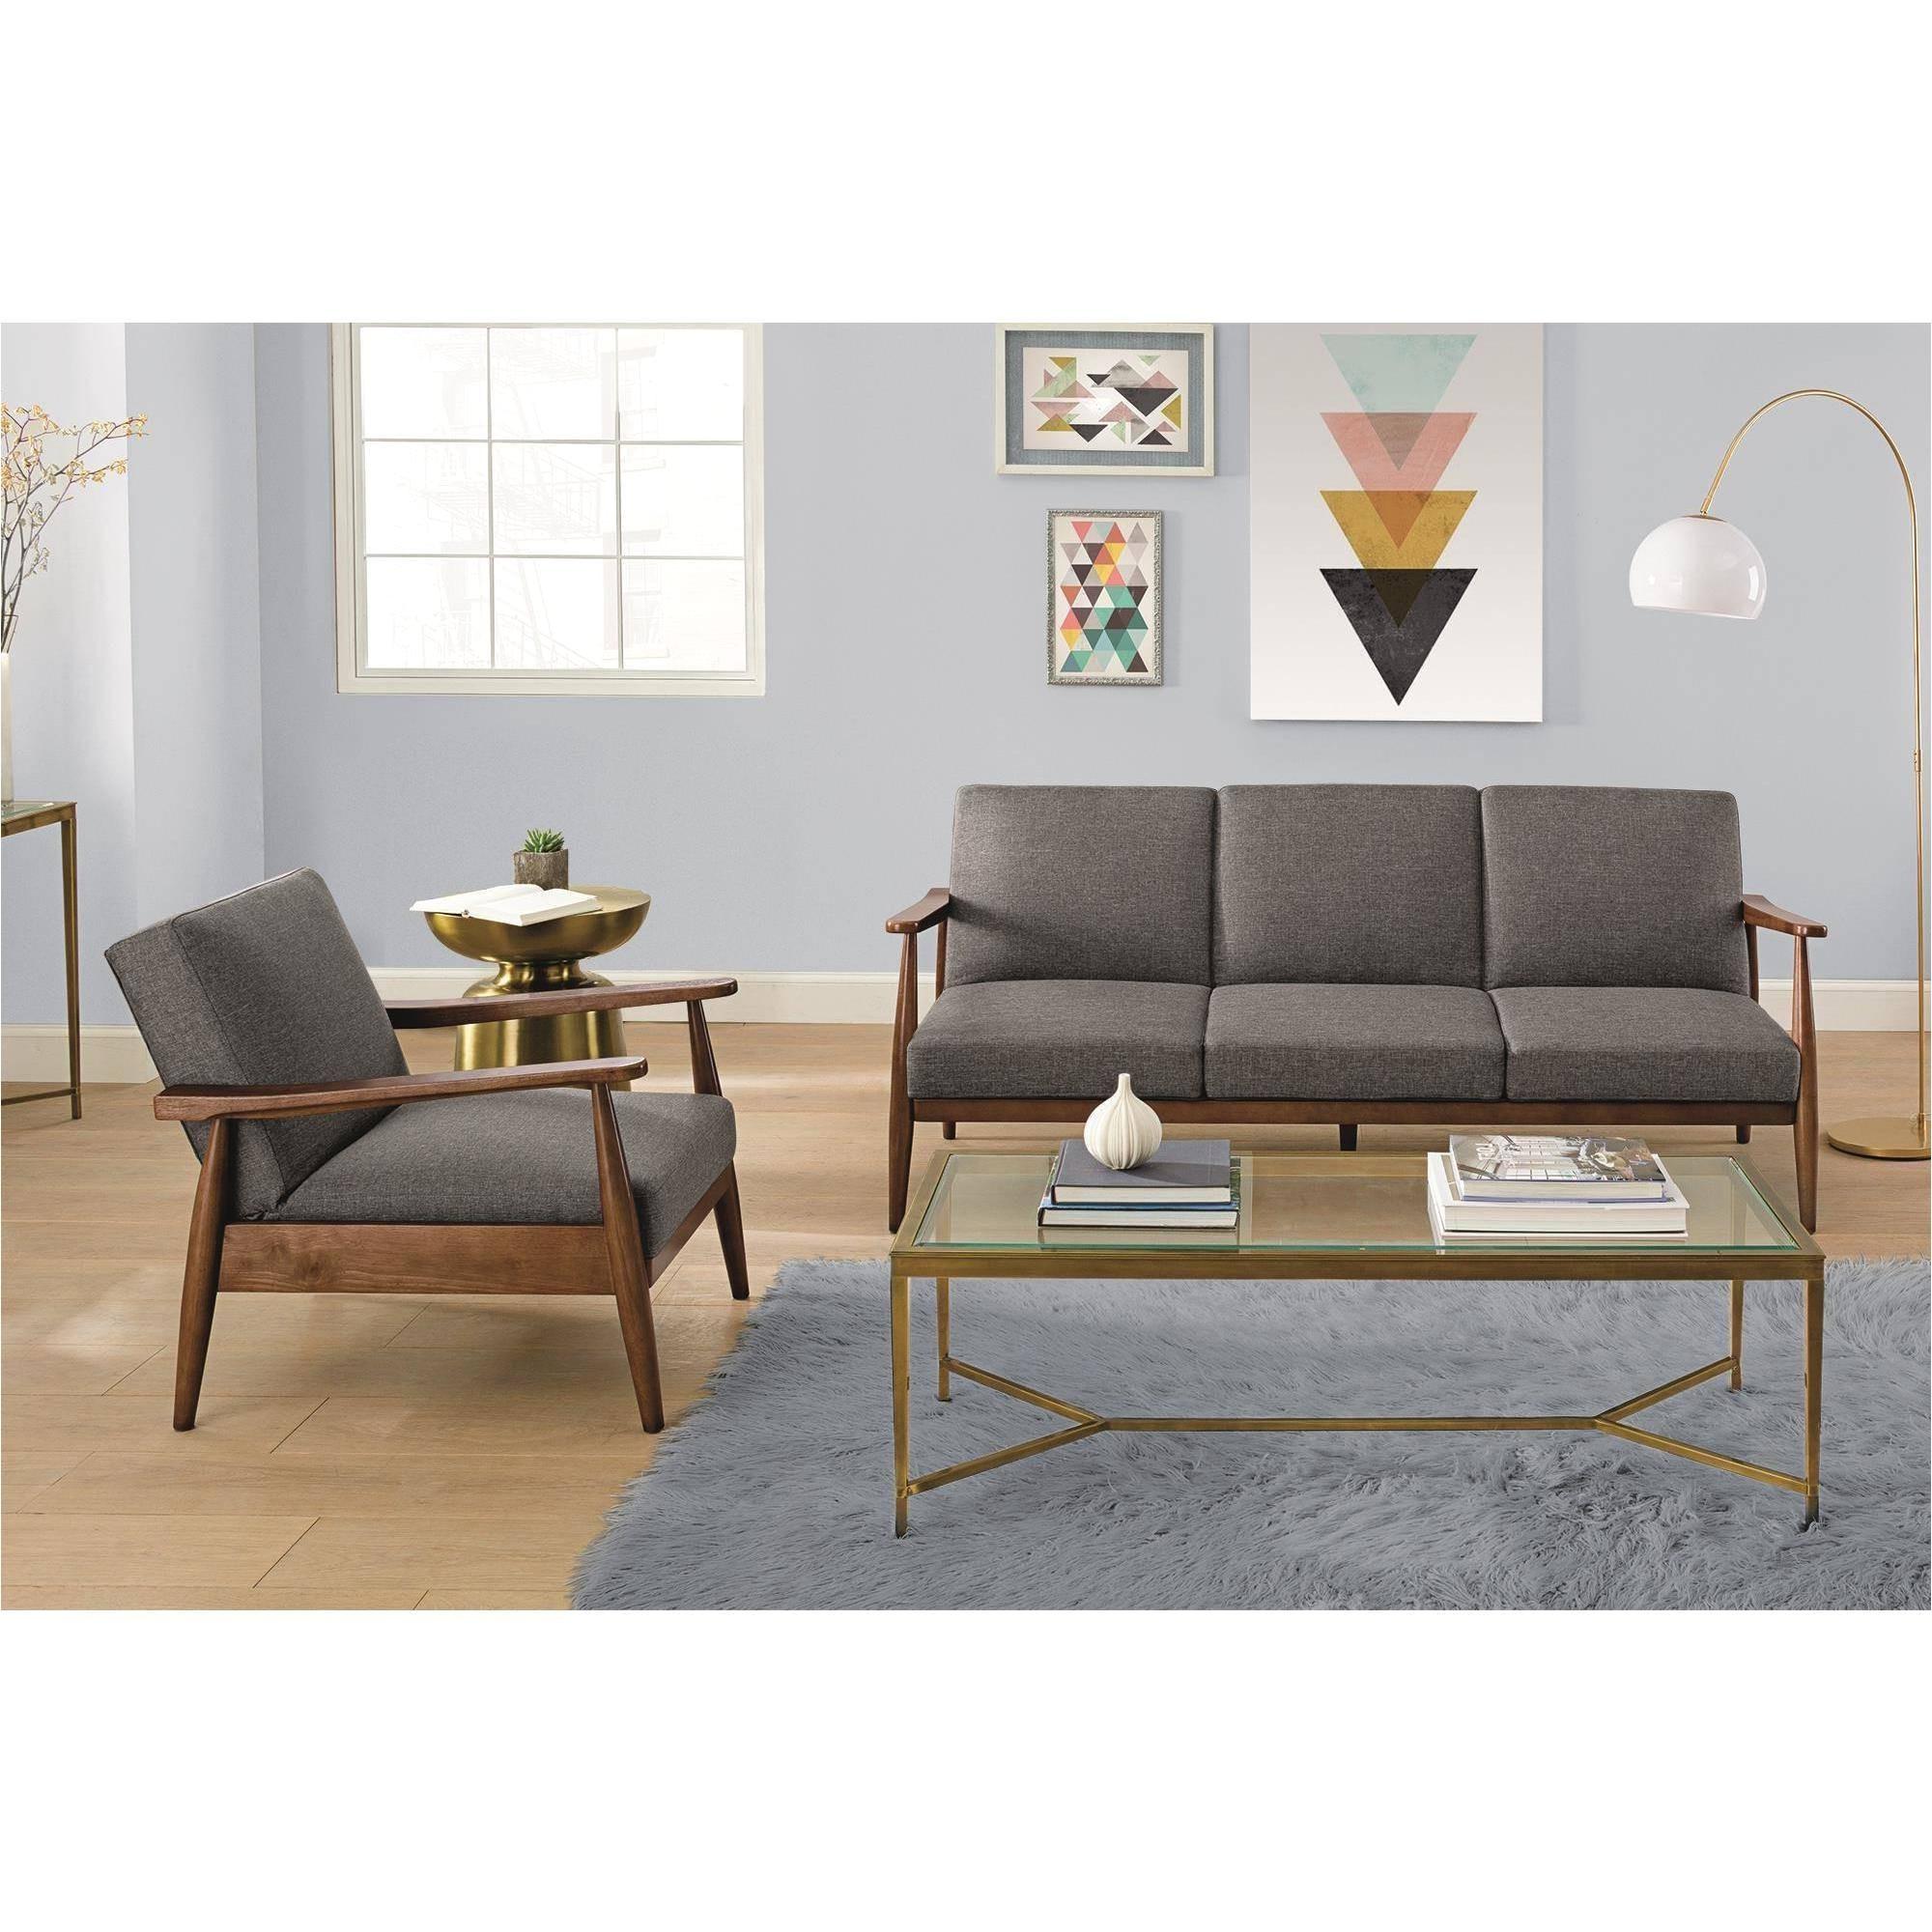 Boscovs Sectional sofas sofas Sectionals Multiple Colors Buchannan Microfiber sofa